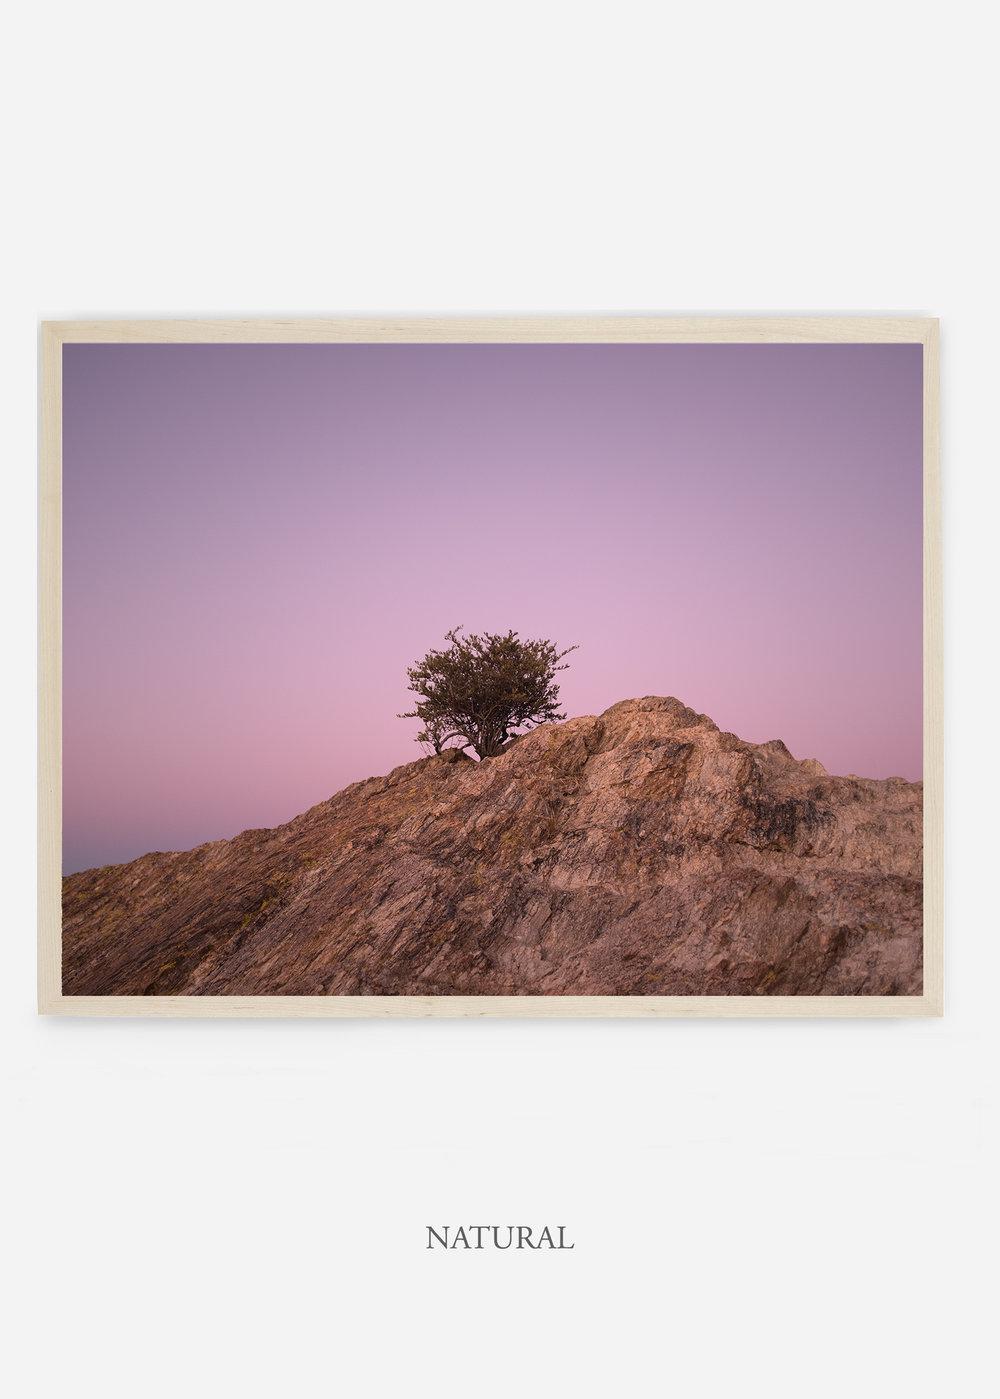 nomat_naturalframe-saguaroNo.11-wildercalifornia-art-wallart-cactusprint-homedecor-prints-arizona-botanical-artwork-interiordesign.jpg